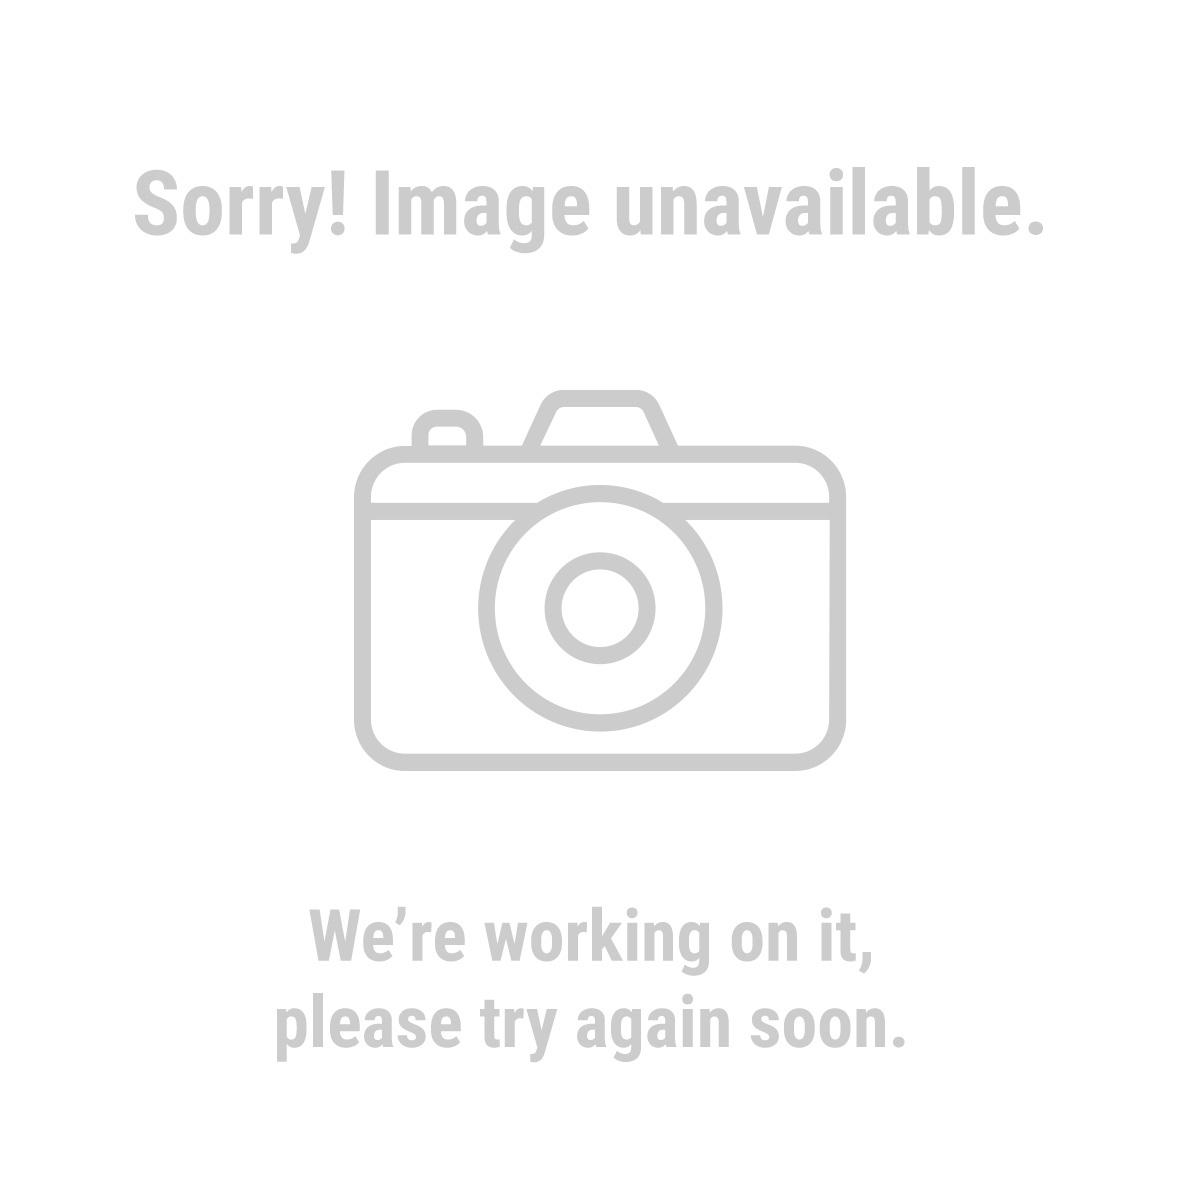 Gorilla 94730 2 Oz. Gorilla Glue